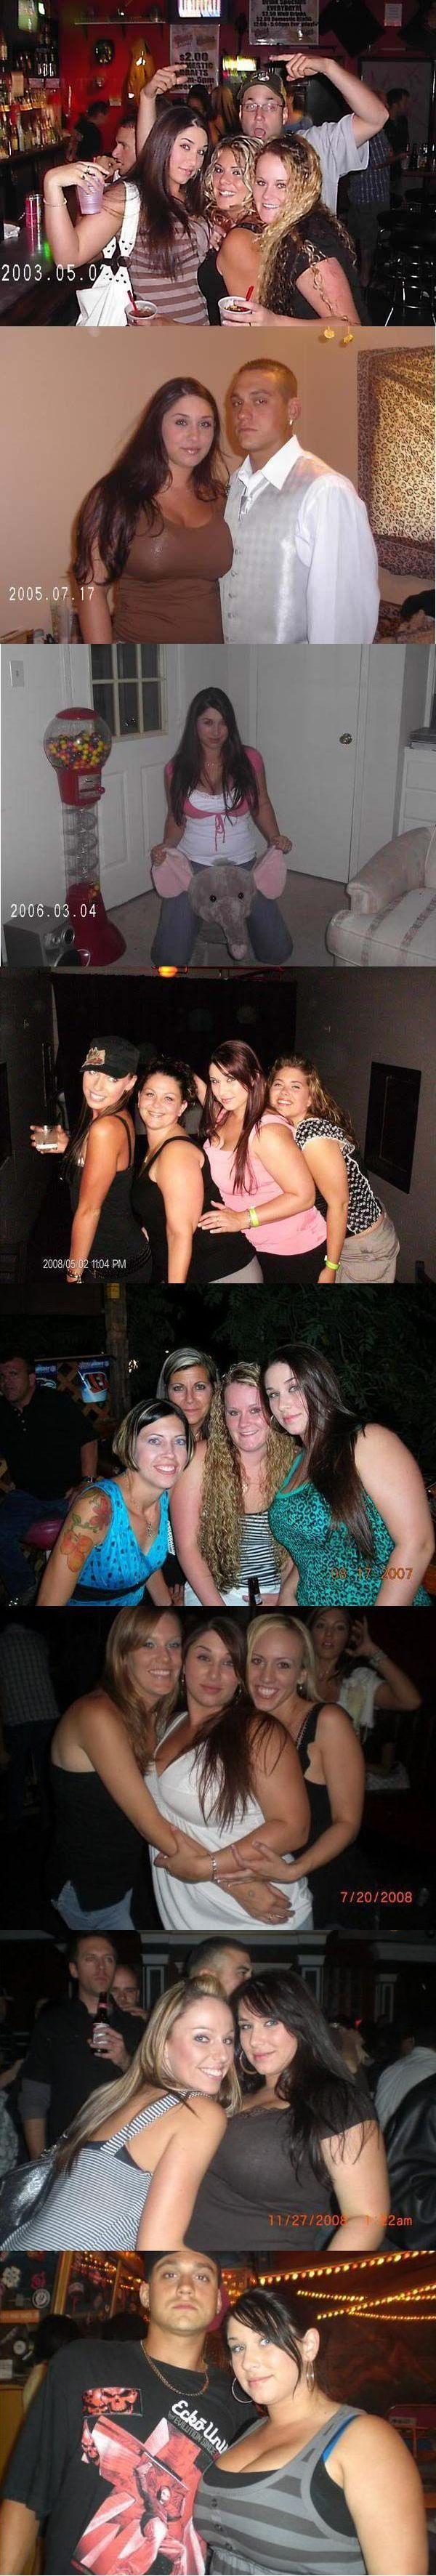 сильно похудел за 2 месяца